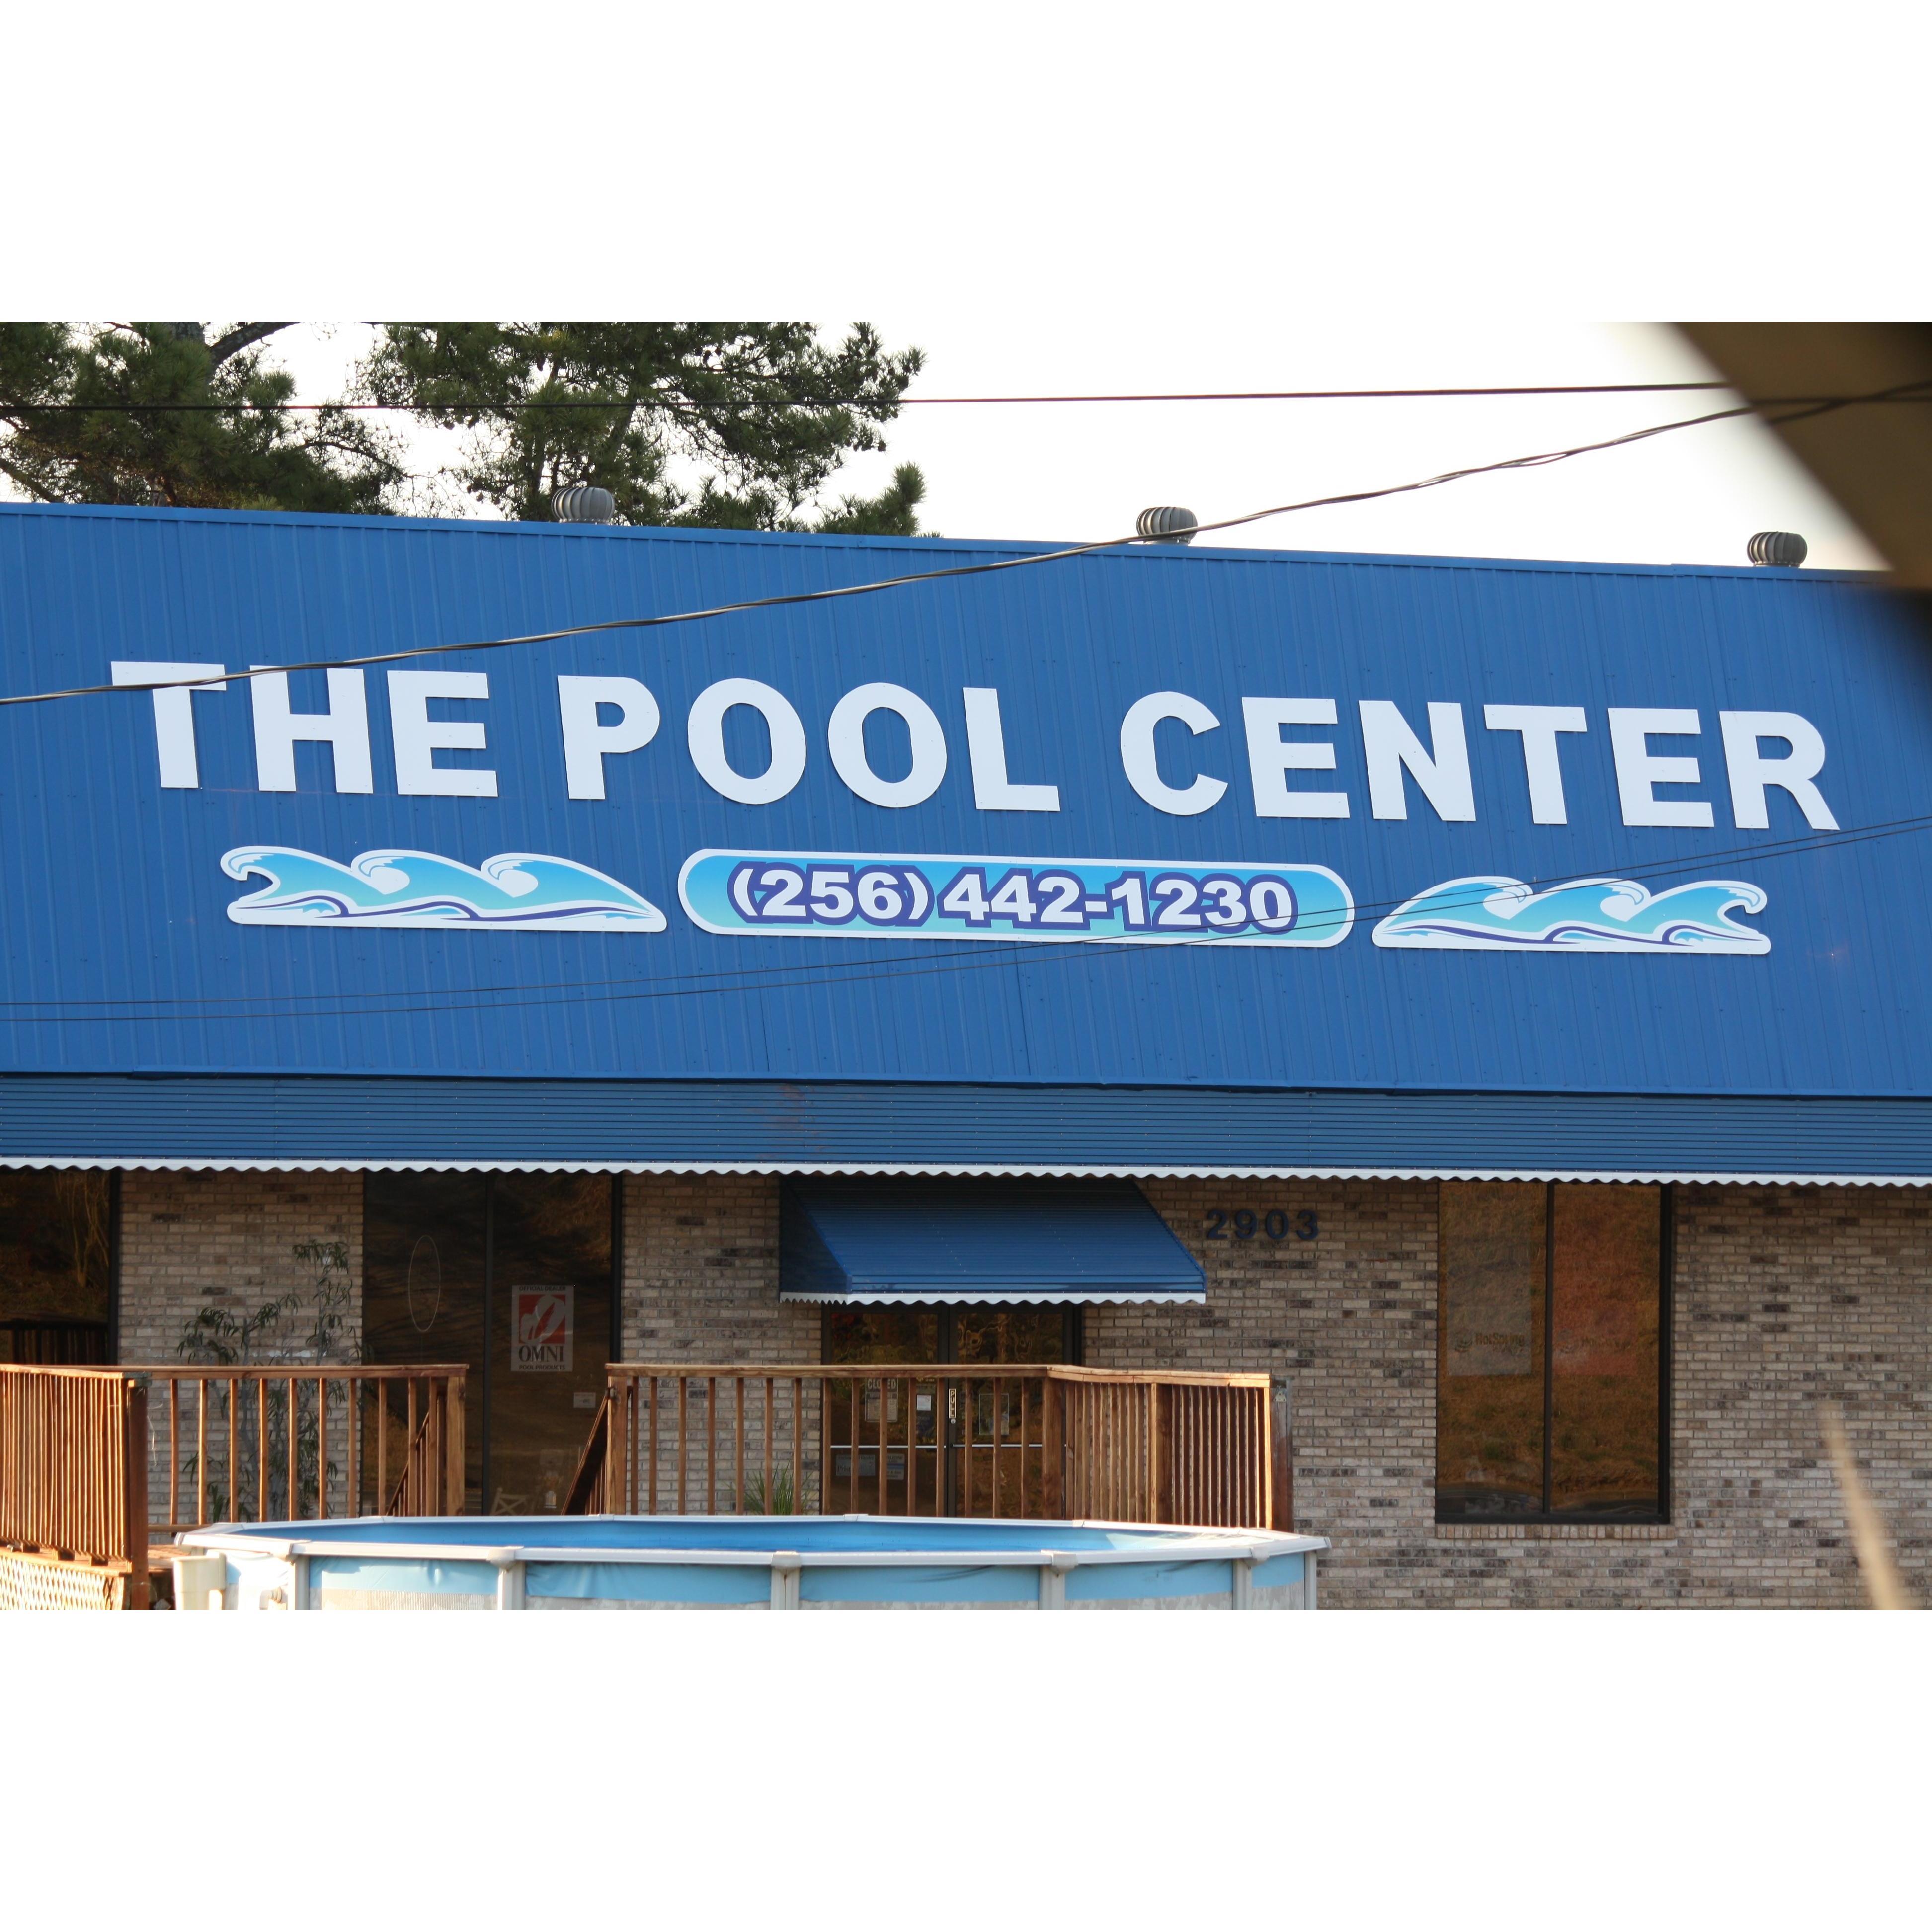 Swimming Pools Hot Tubs And Sauna Equipment And Supplies Rainbow City Alabama Company Data